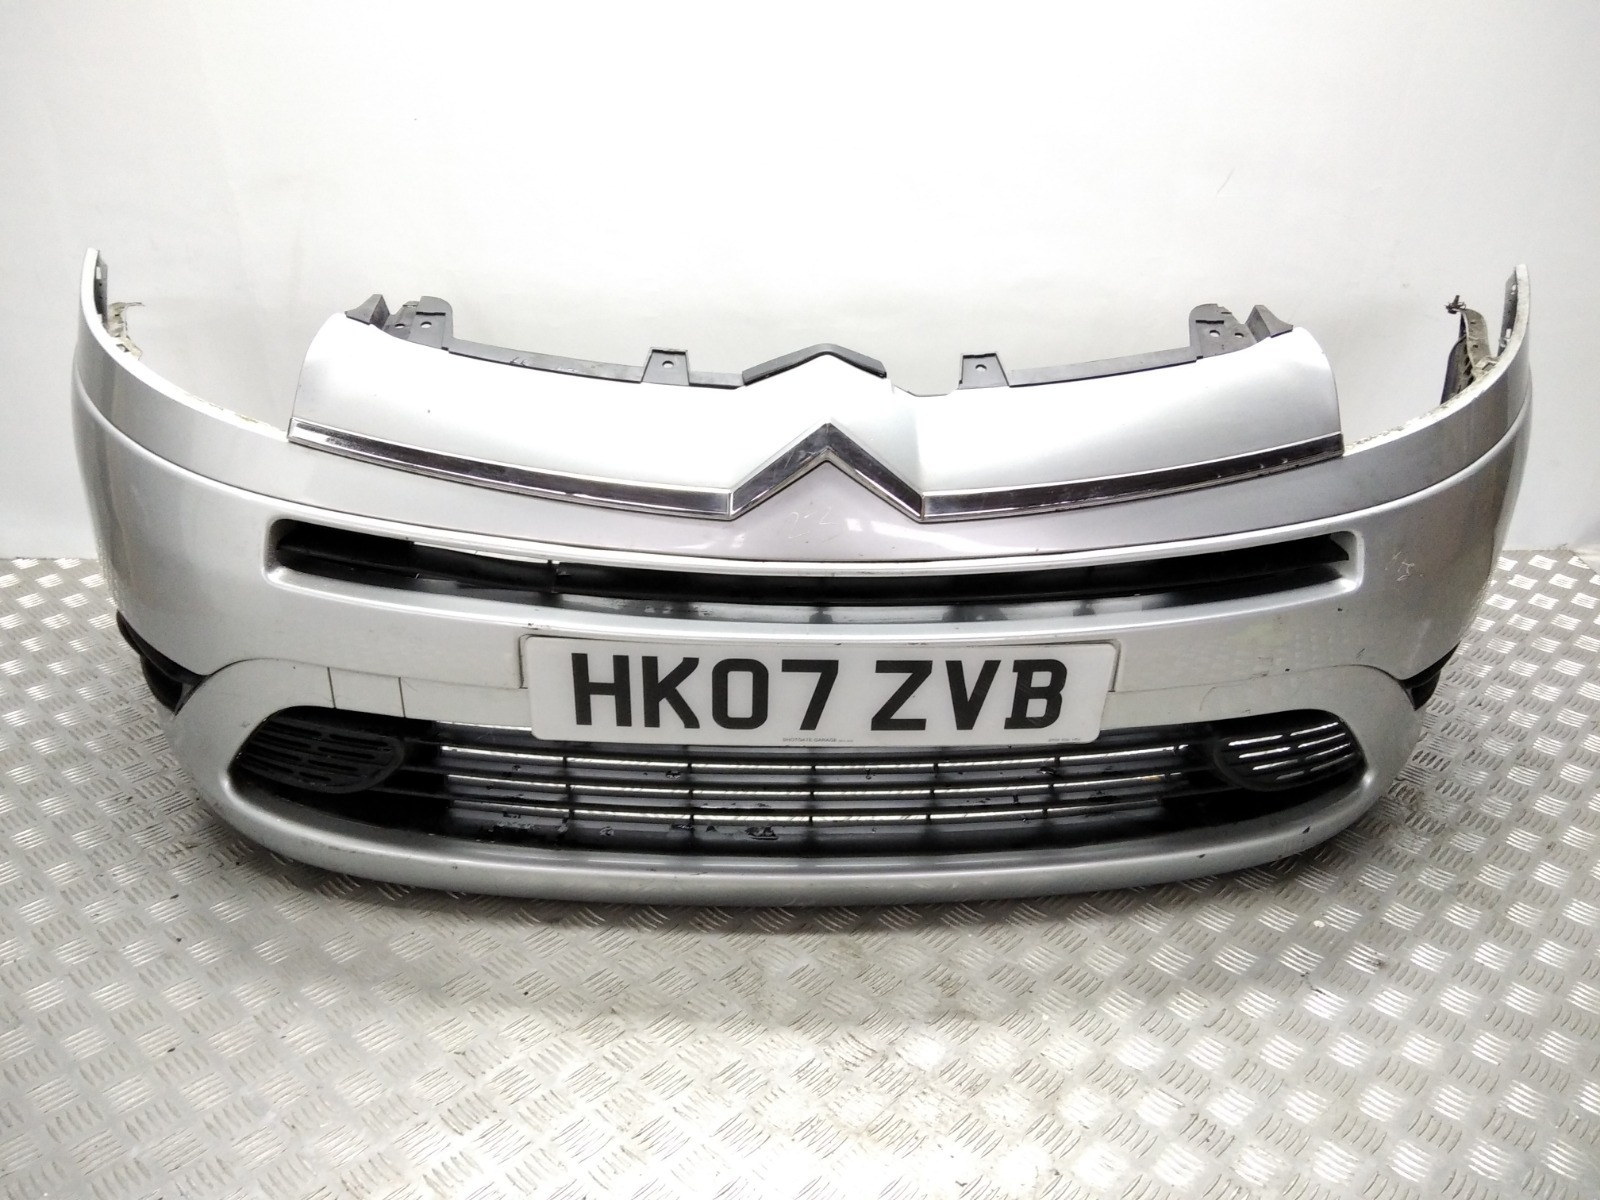 Бампер передний Citroen C4 Picasso 1.6 HDI 2007 (б/у)